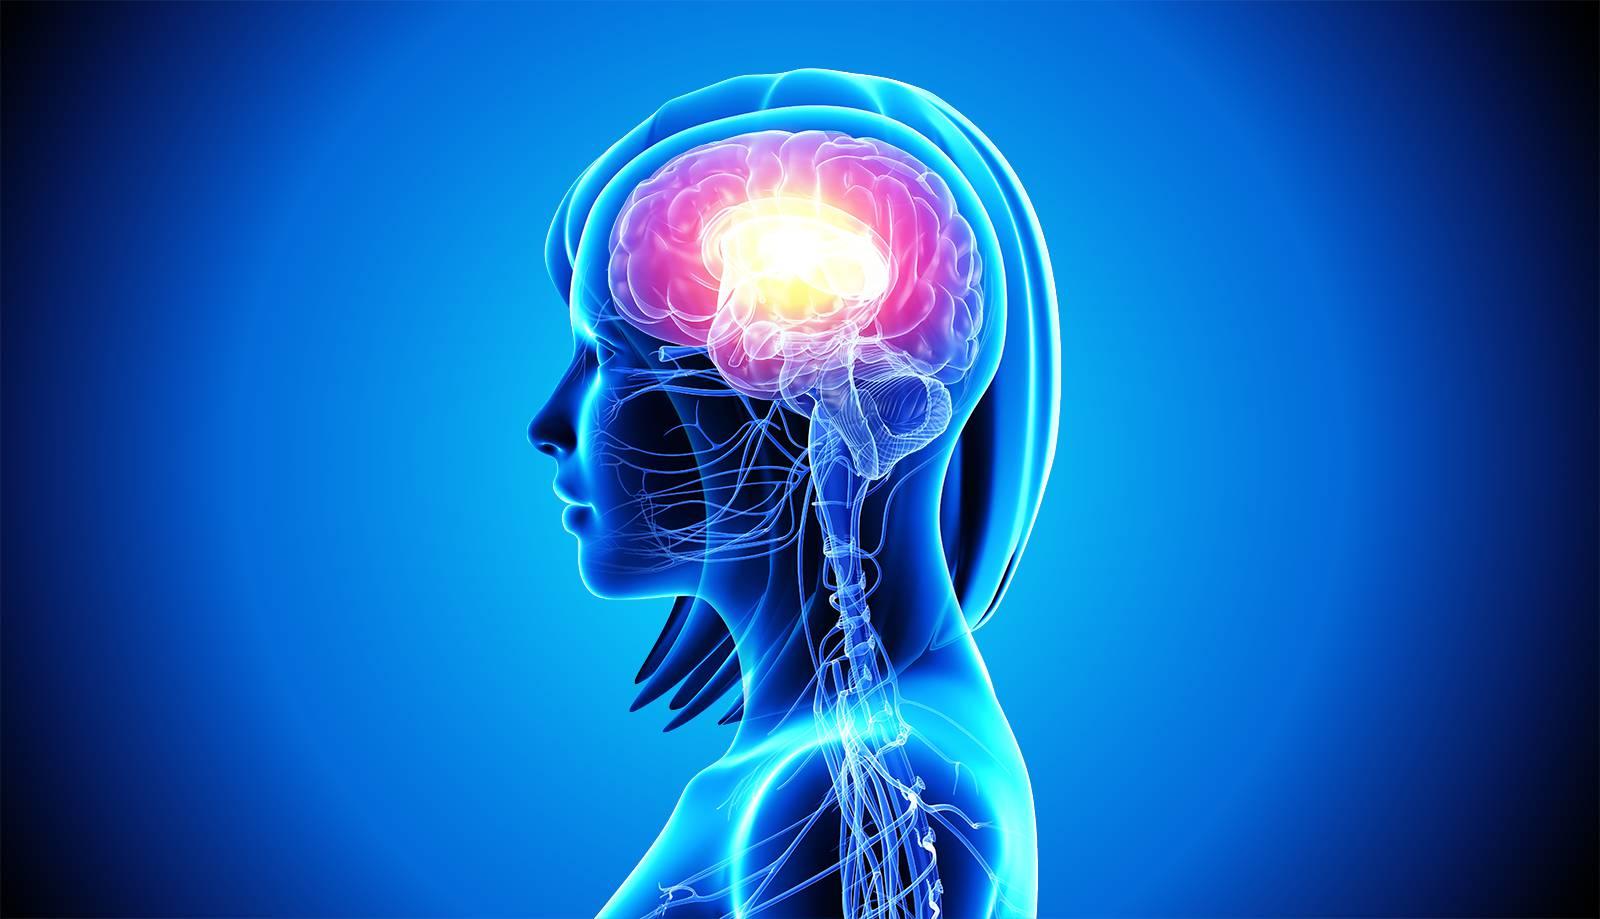 bhakti-cranial-cranio-sacral-therapy-stewart-snyder.jpg